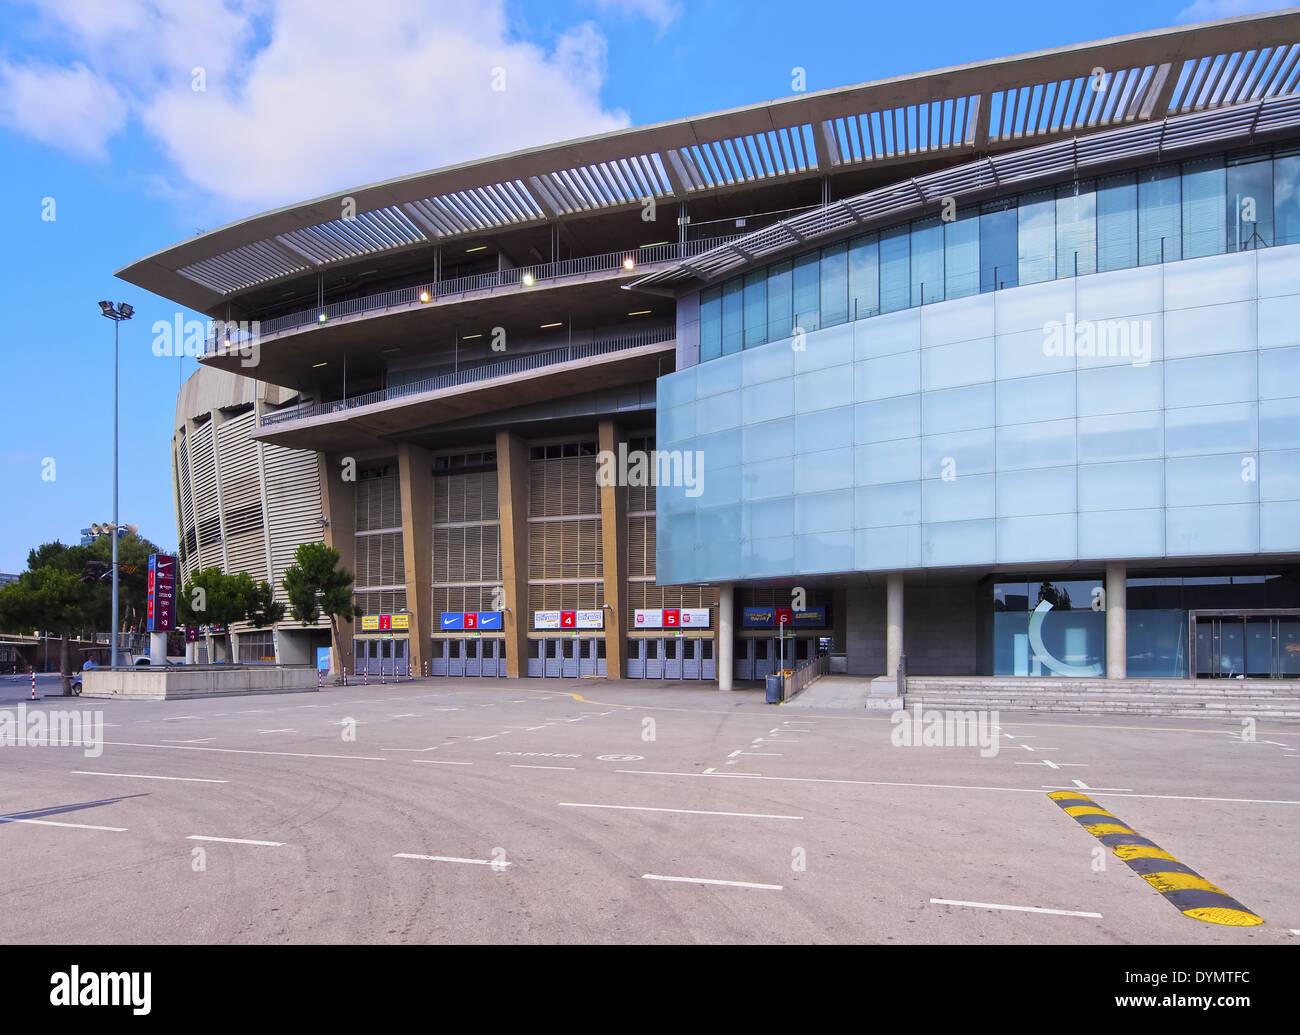 Estadi del F.C. Barcelona - Camp Nou - a football stadium in Barcelona, Catalonia, Spain - Stock Image